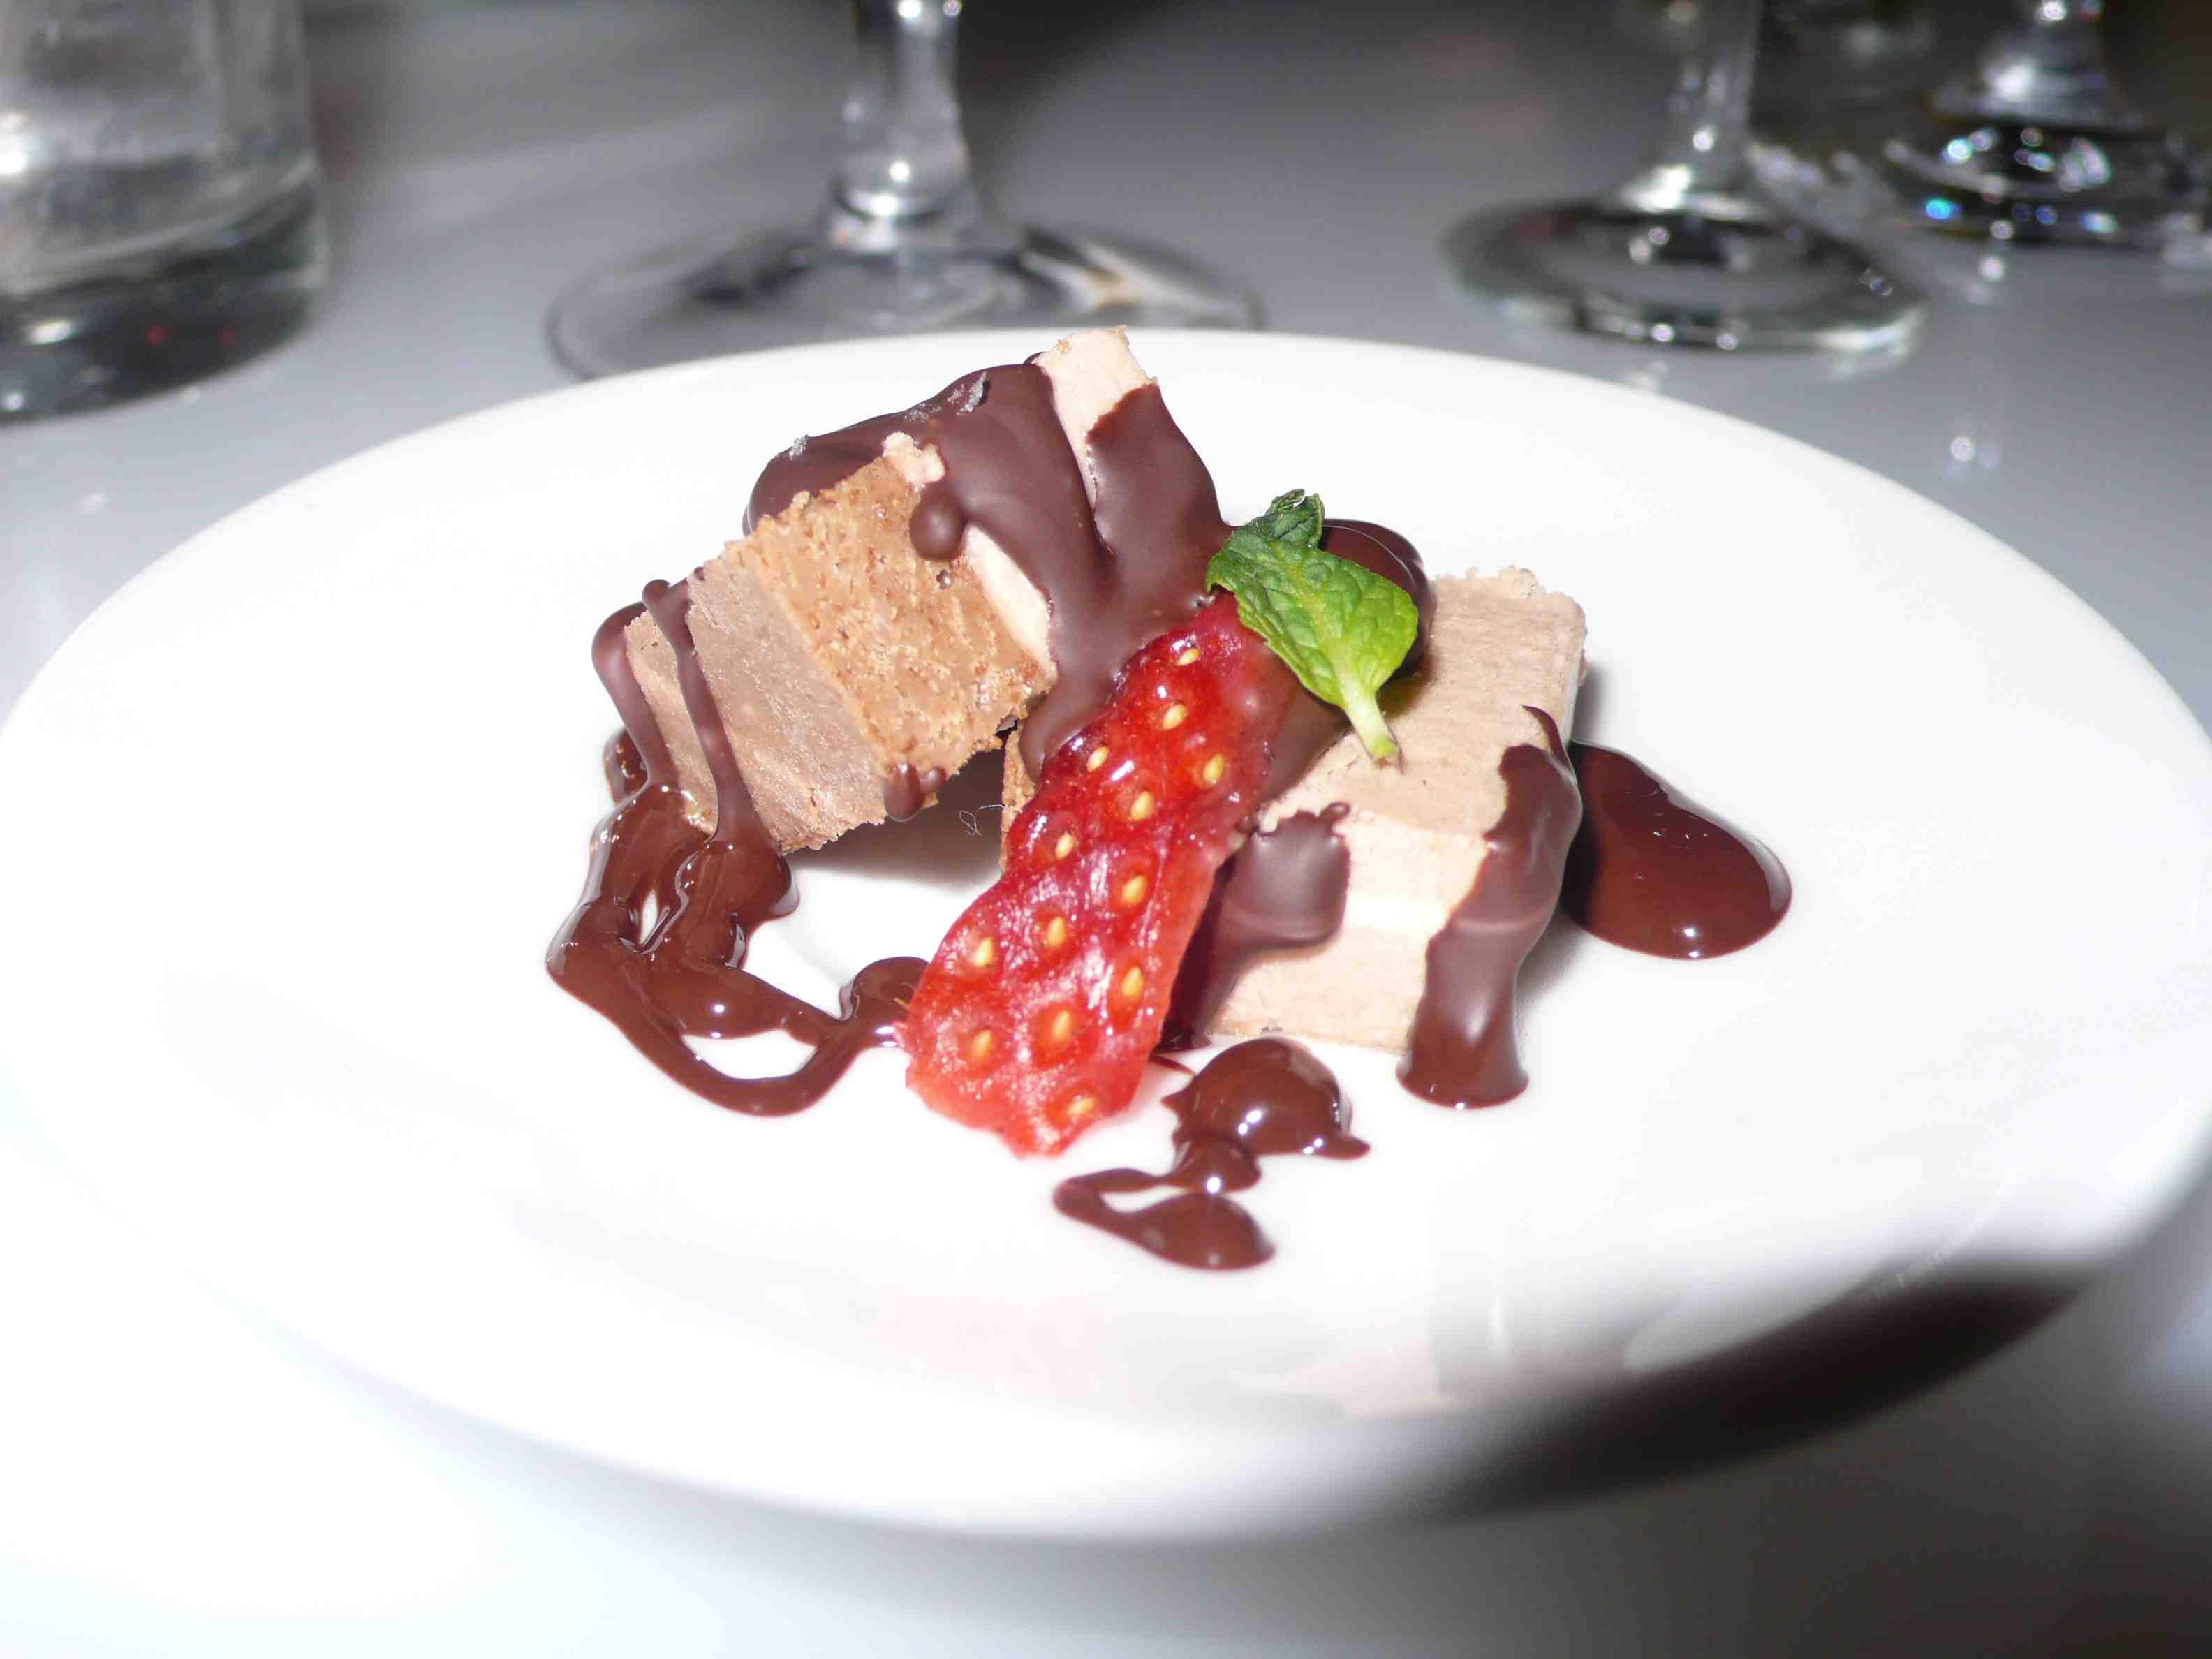 Kit Kat dessert